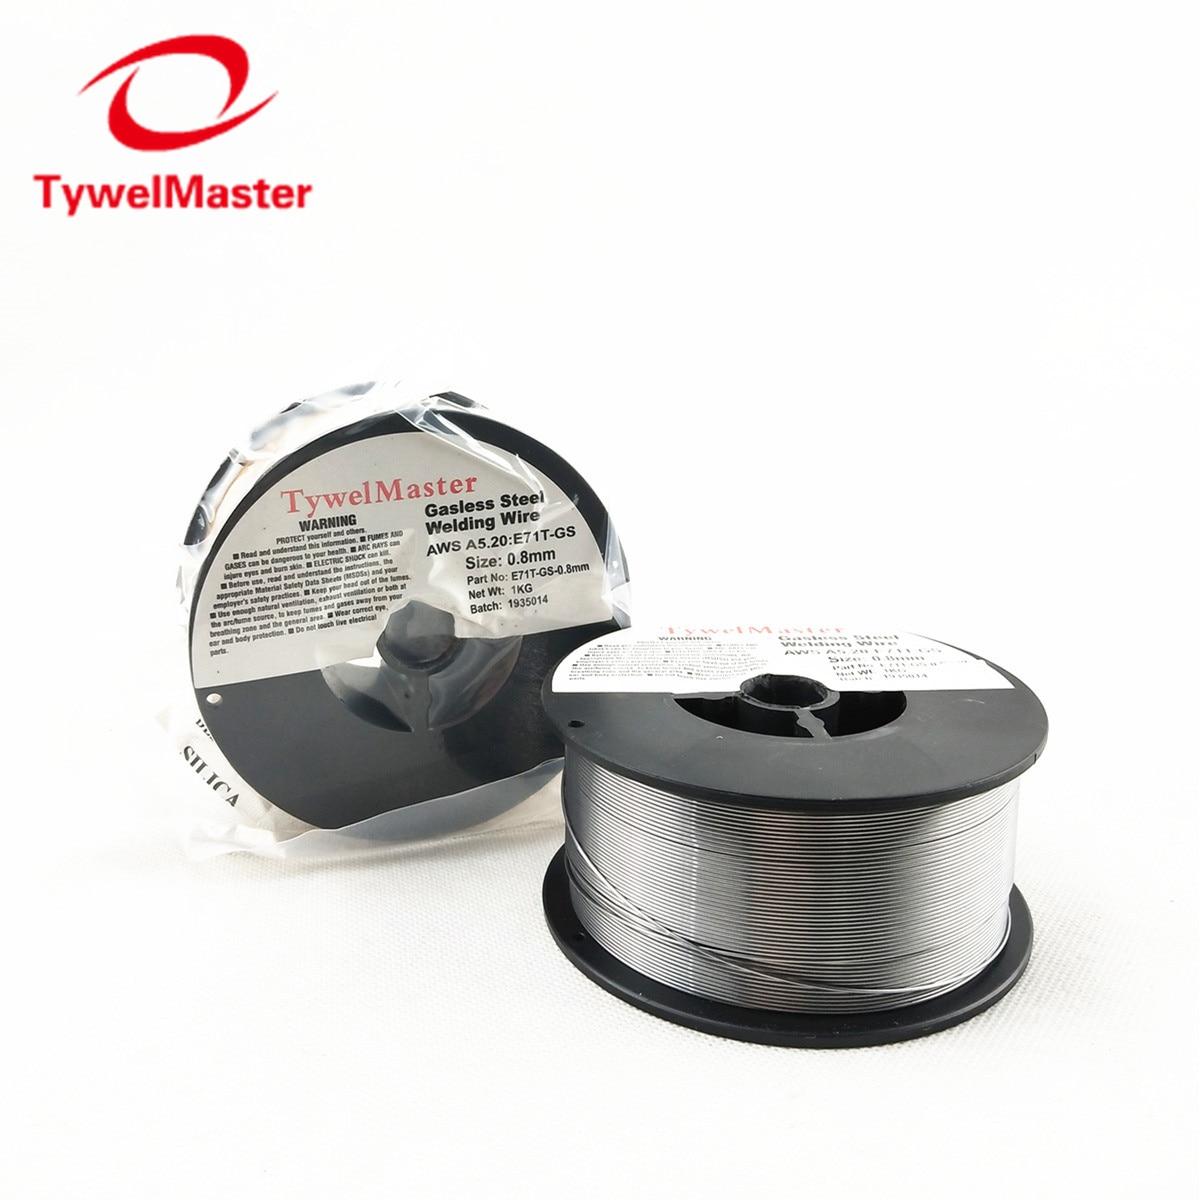 1pcs Gasless Welding Wire E71T-GS 0.9mm 0.9KG 2LB Spool AWS A5.20 ISO 17632 Mig Welding Сварка